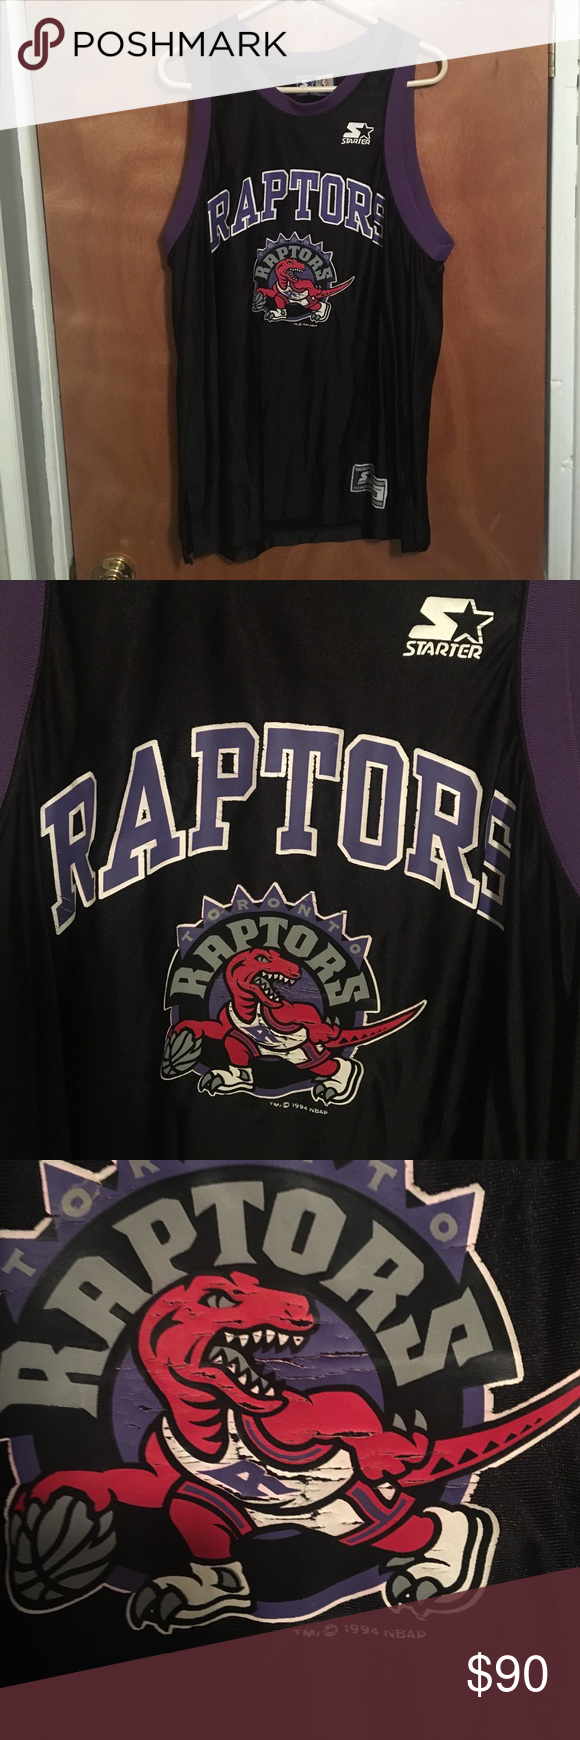 Toronto Raptors Vintage Starter Jersey NBA Toronto Raptors Vintage Starter Jersey 1994 Starter Shirts